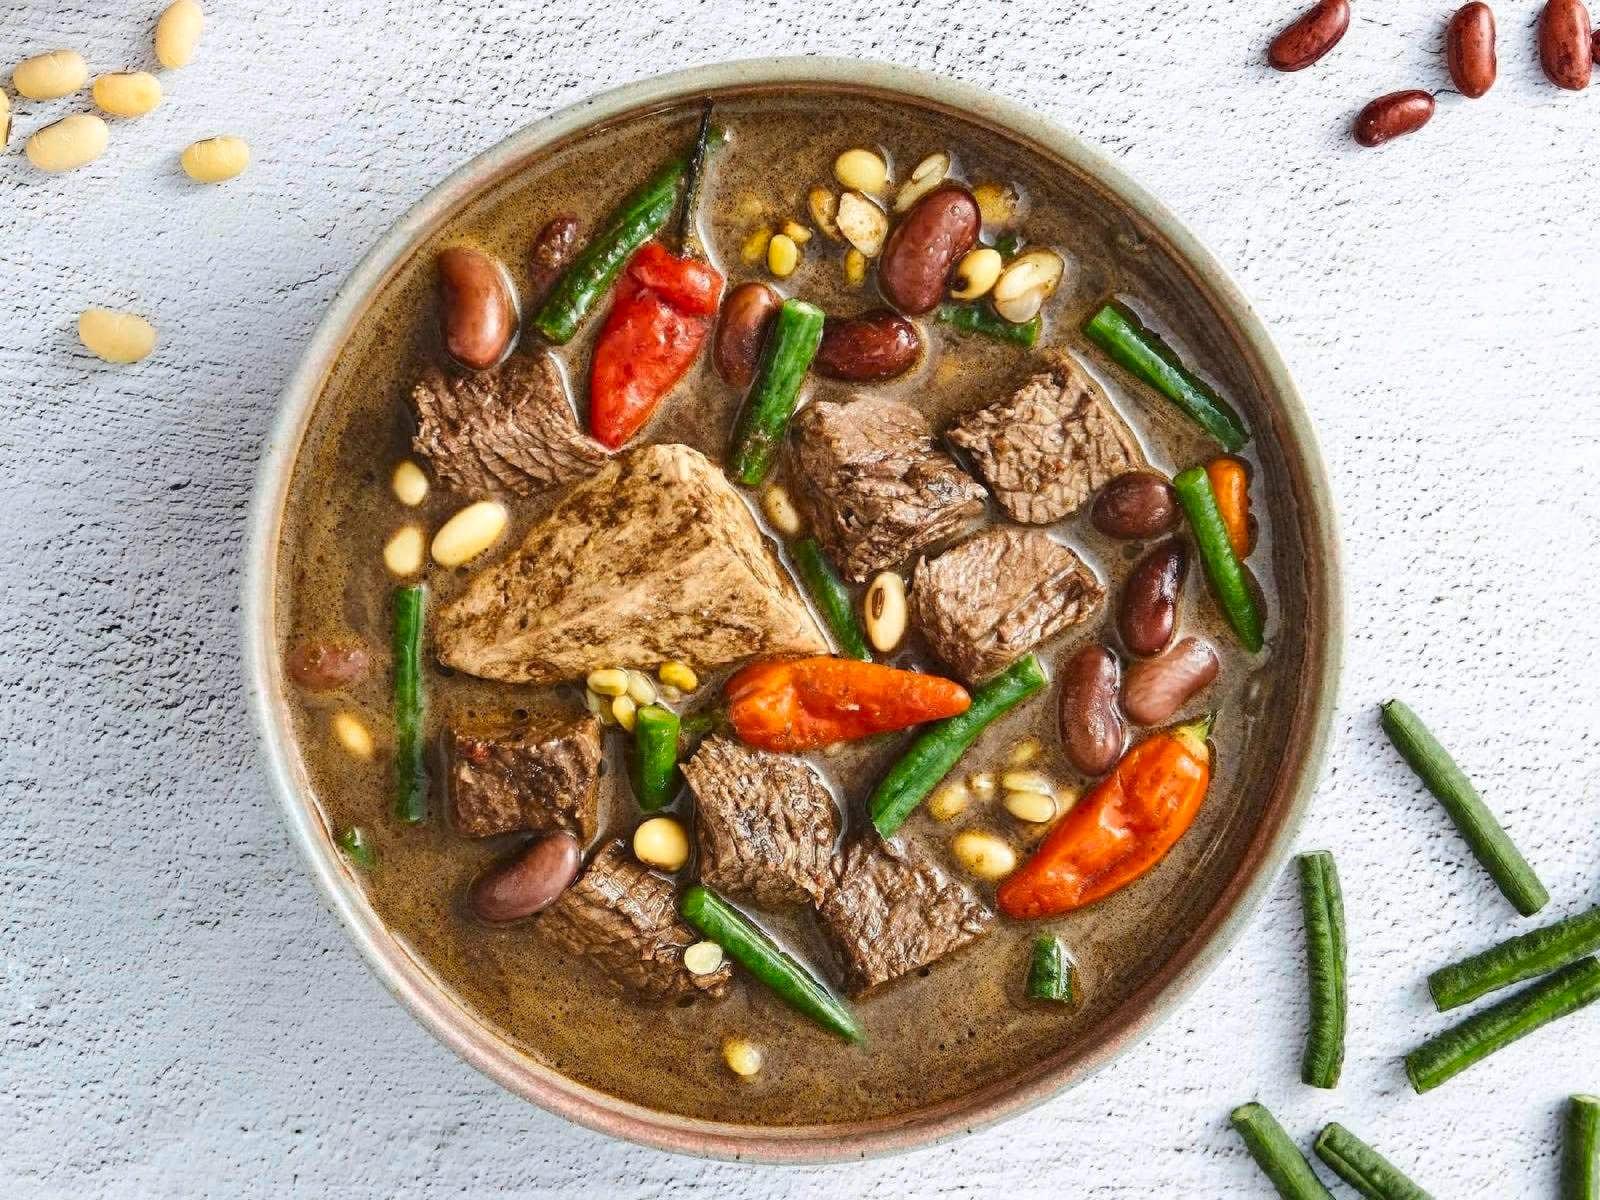 Semangkuk brongkos daging kacang disajikan